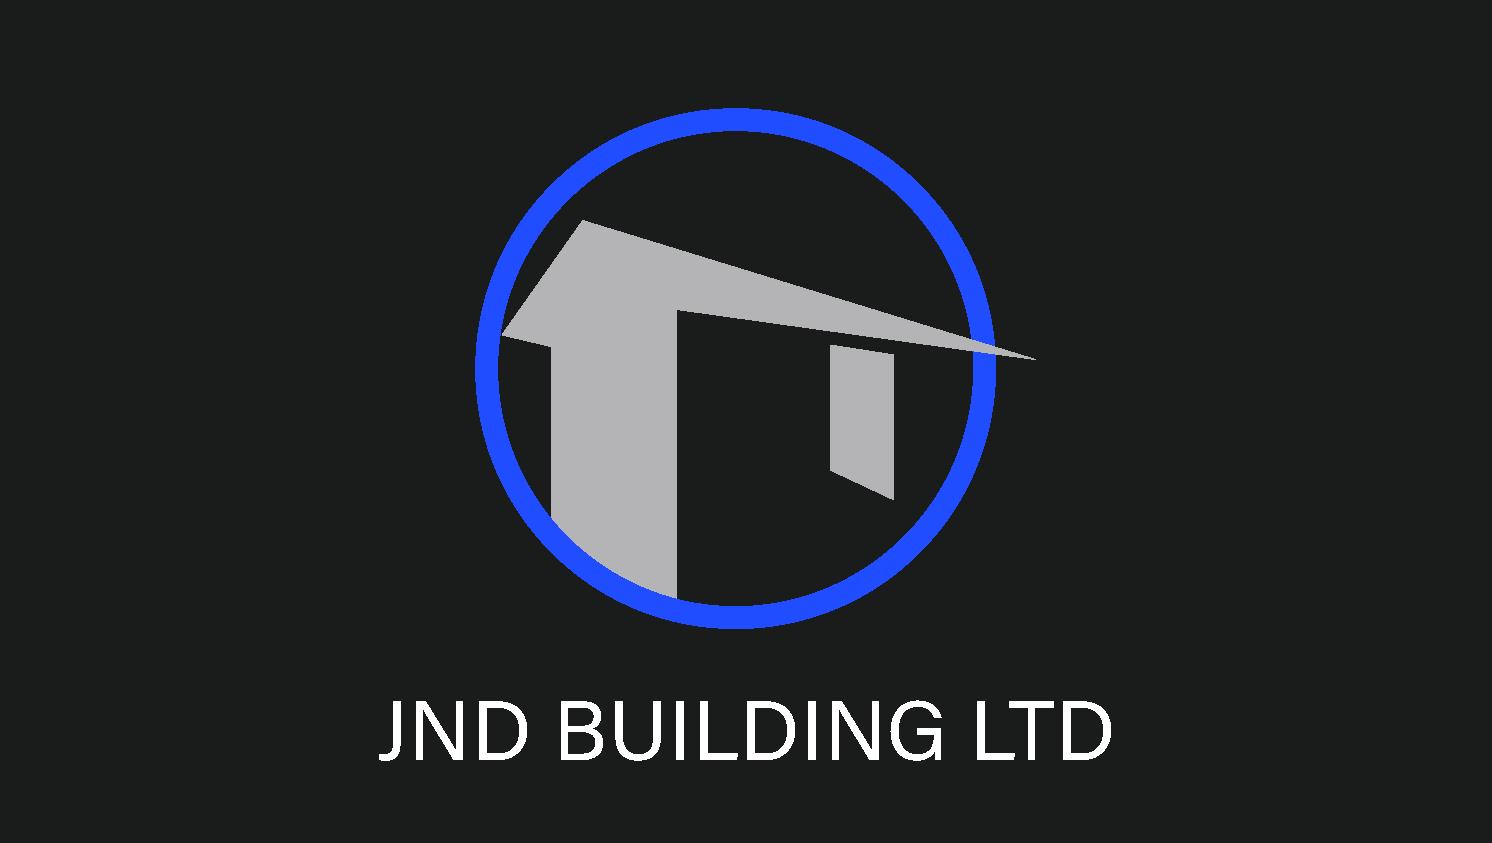 JND Building Limited